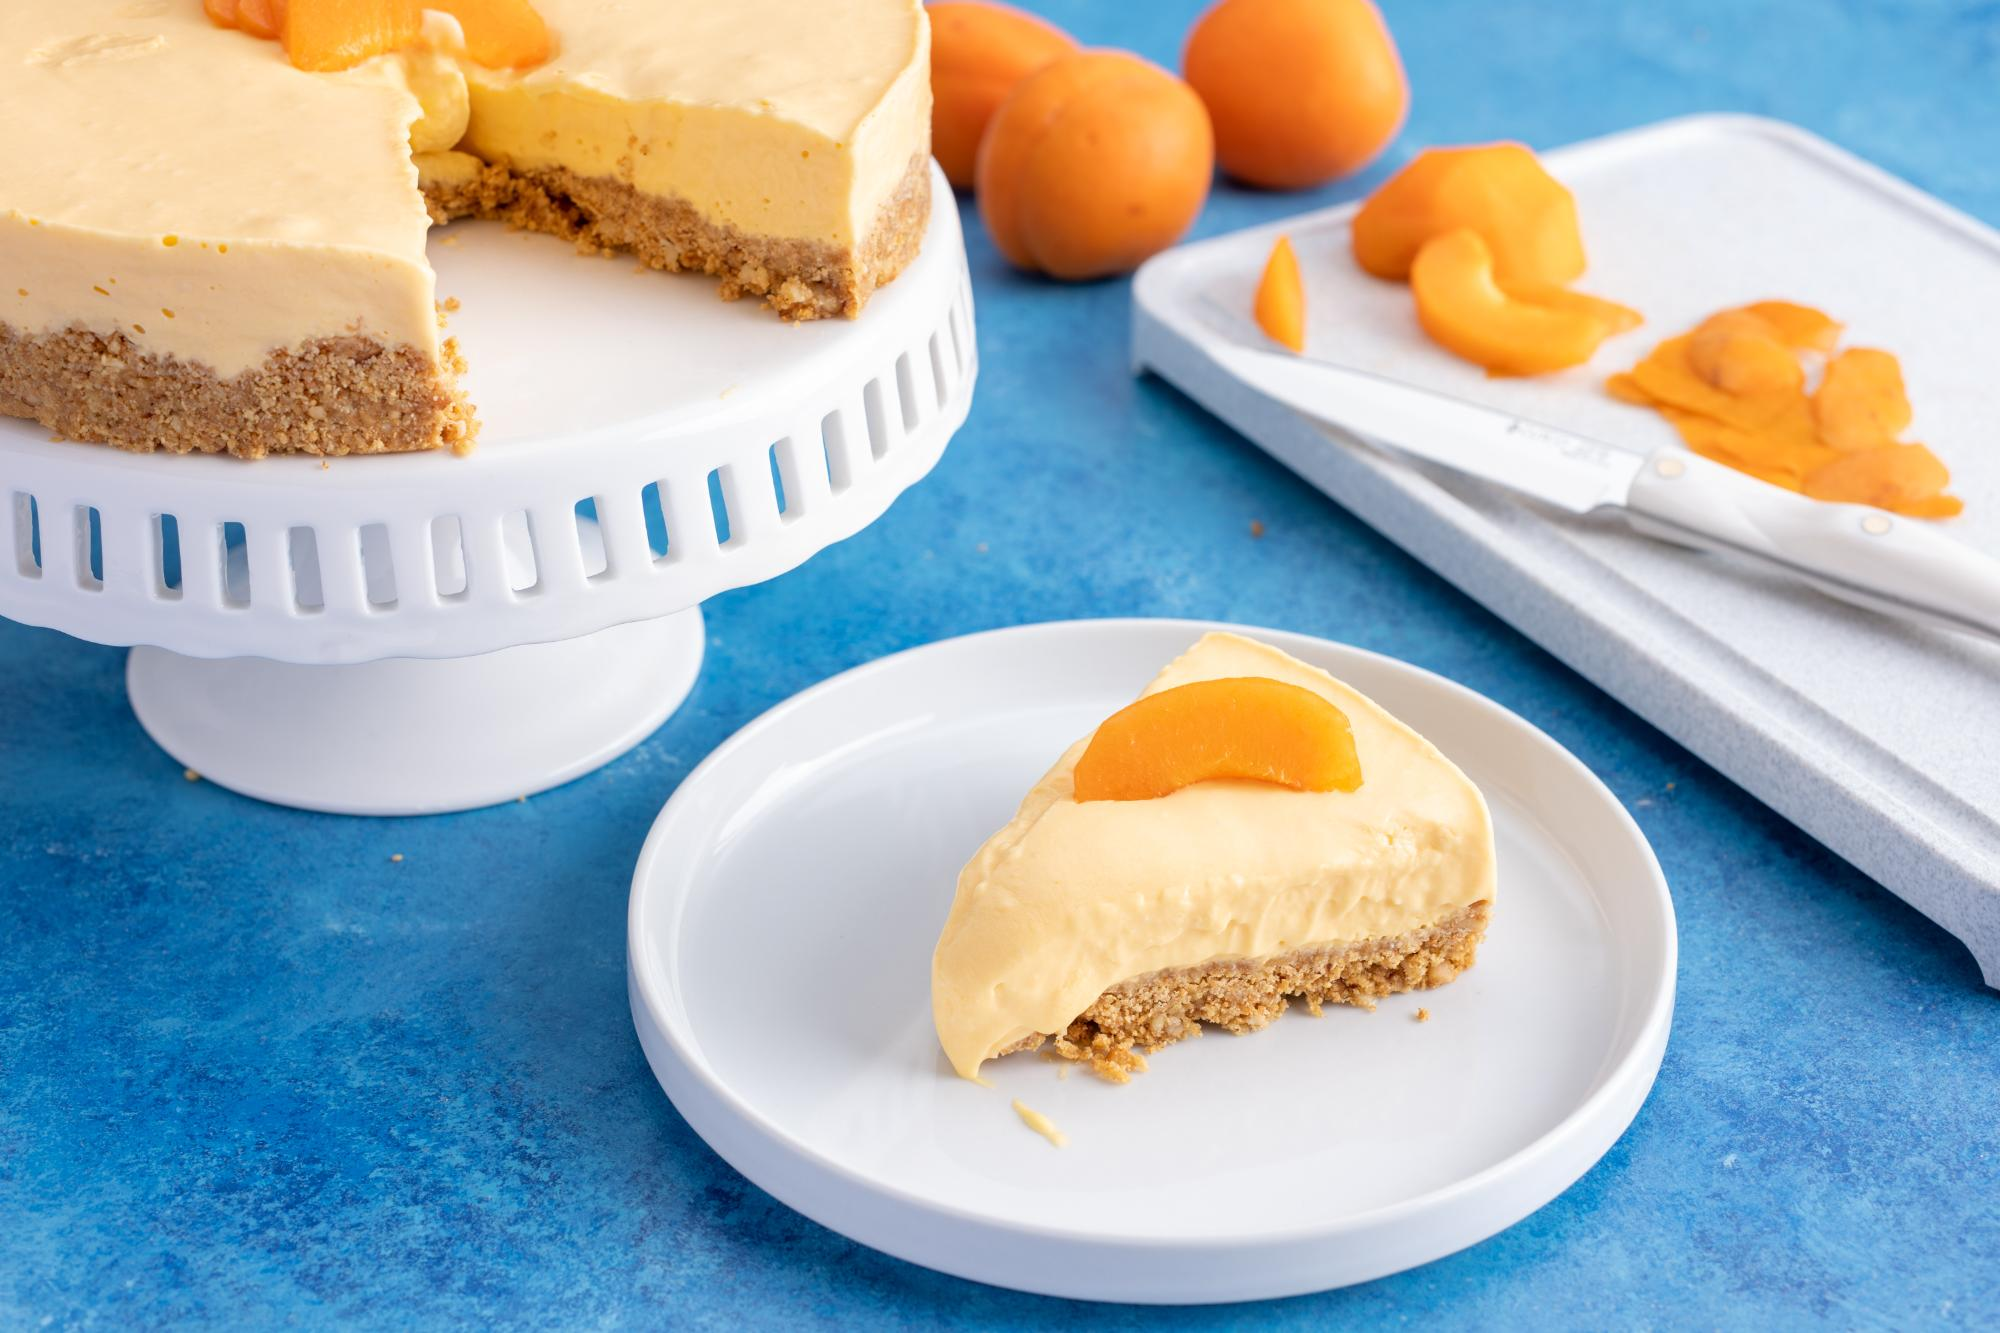 Easy No-Bake Apricot Cheese Tart